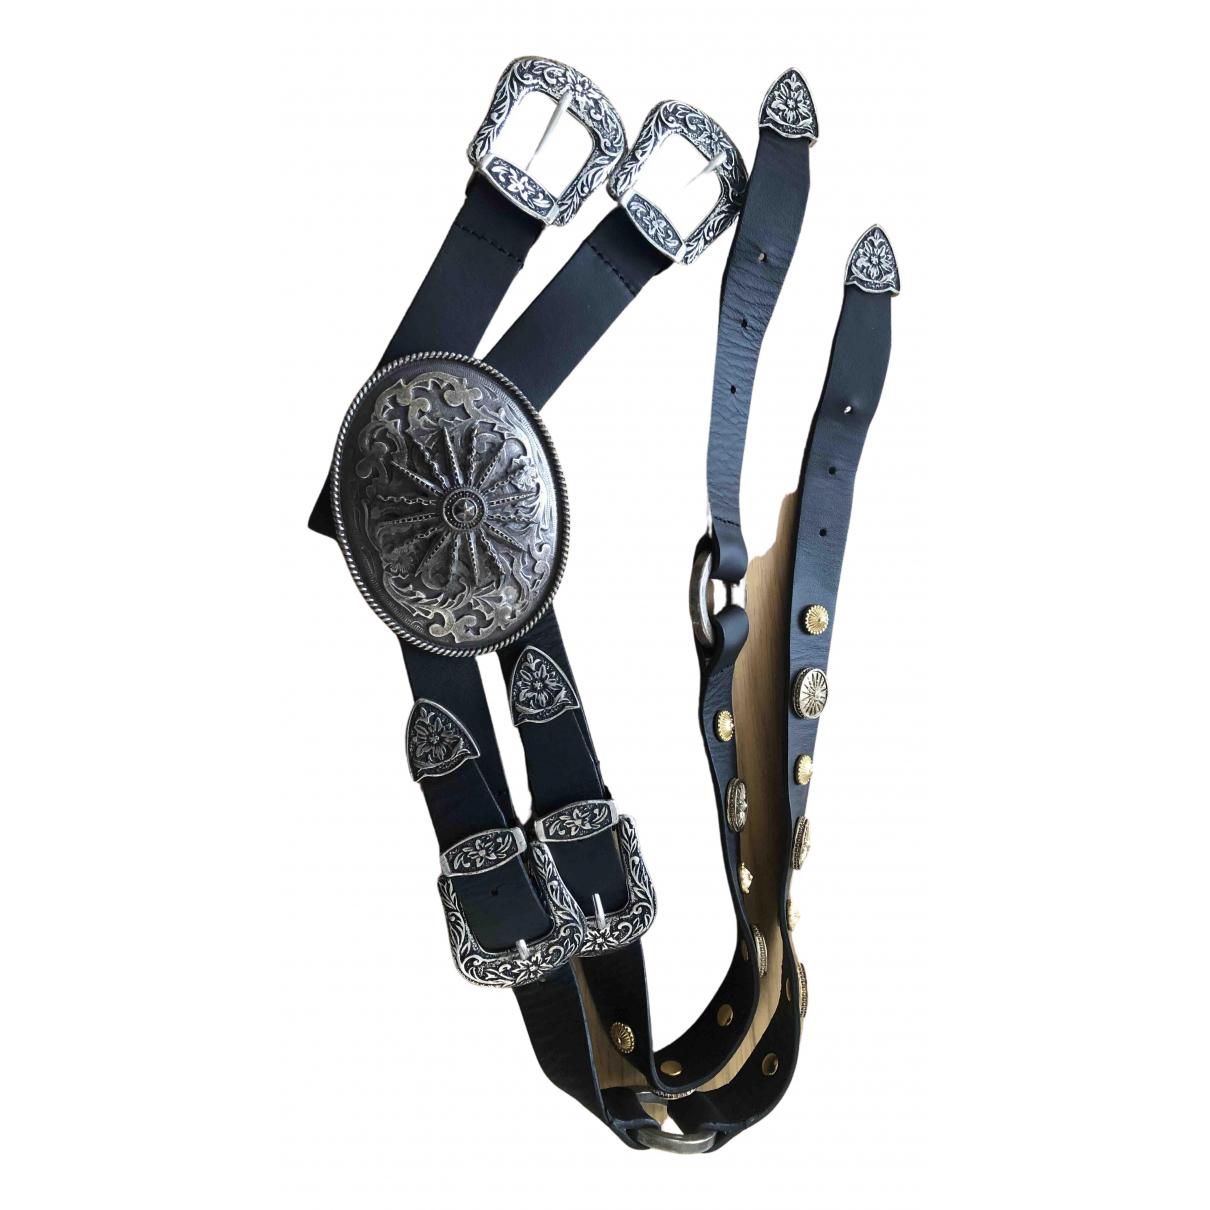 Fausto Puglisi N Black Leather belt for Women XS International